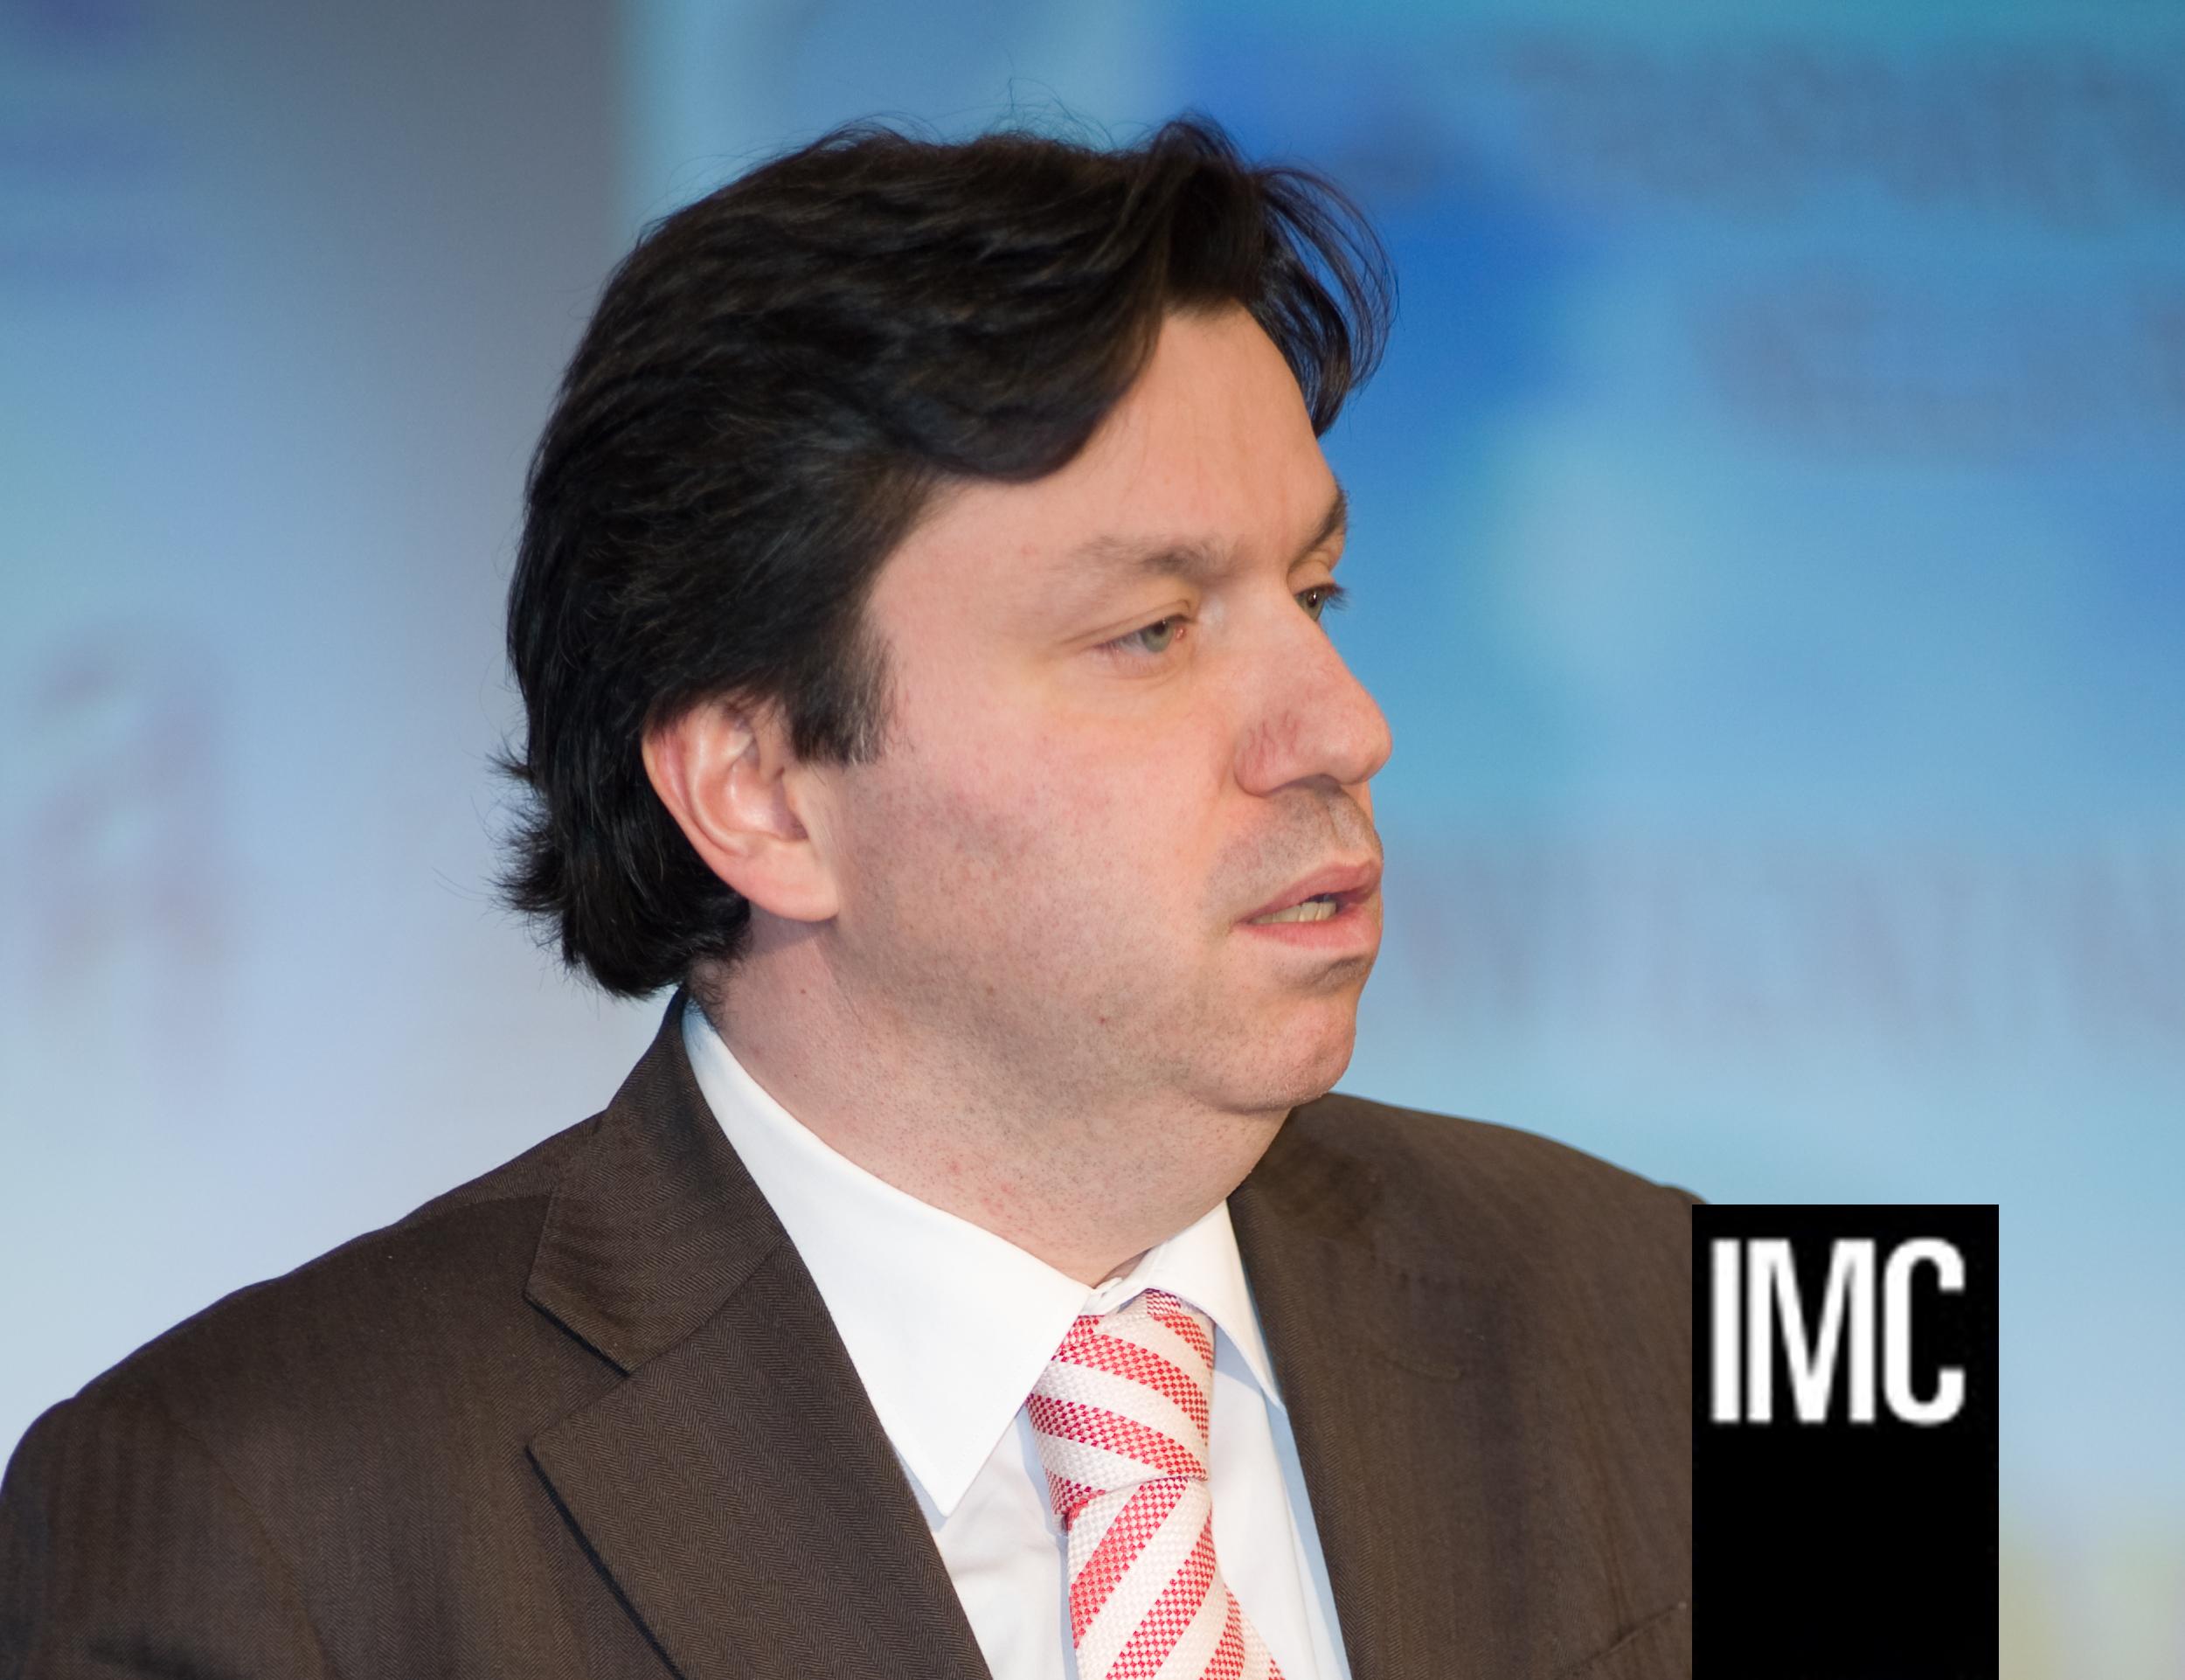 Roberto Salvi IMC